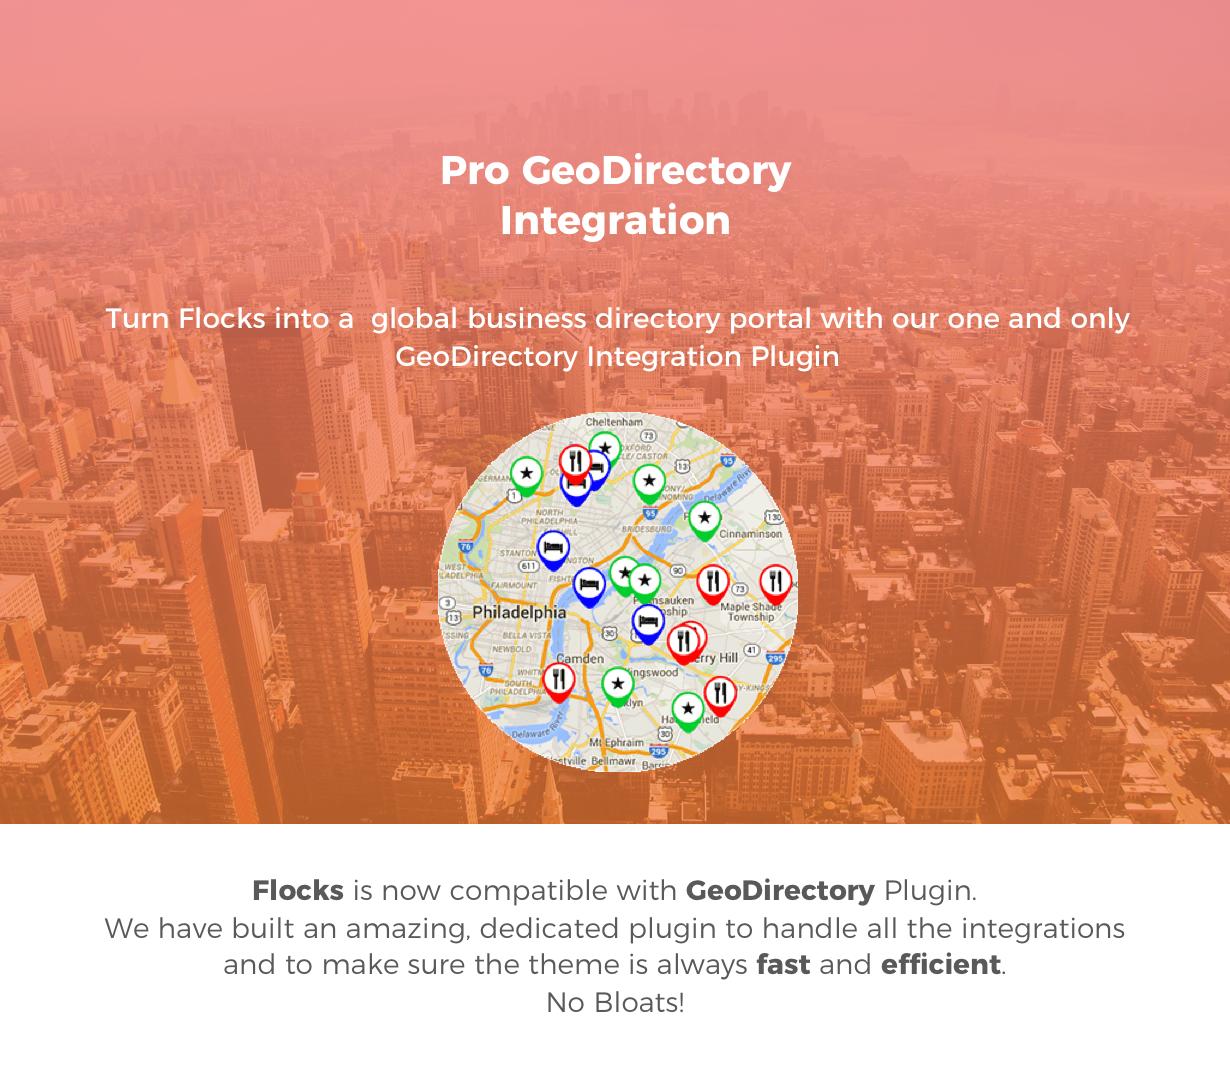 Geodirectory Integration